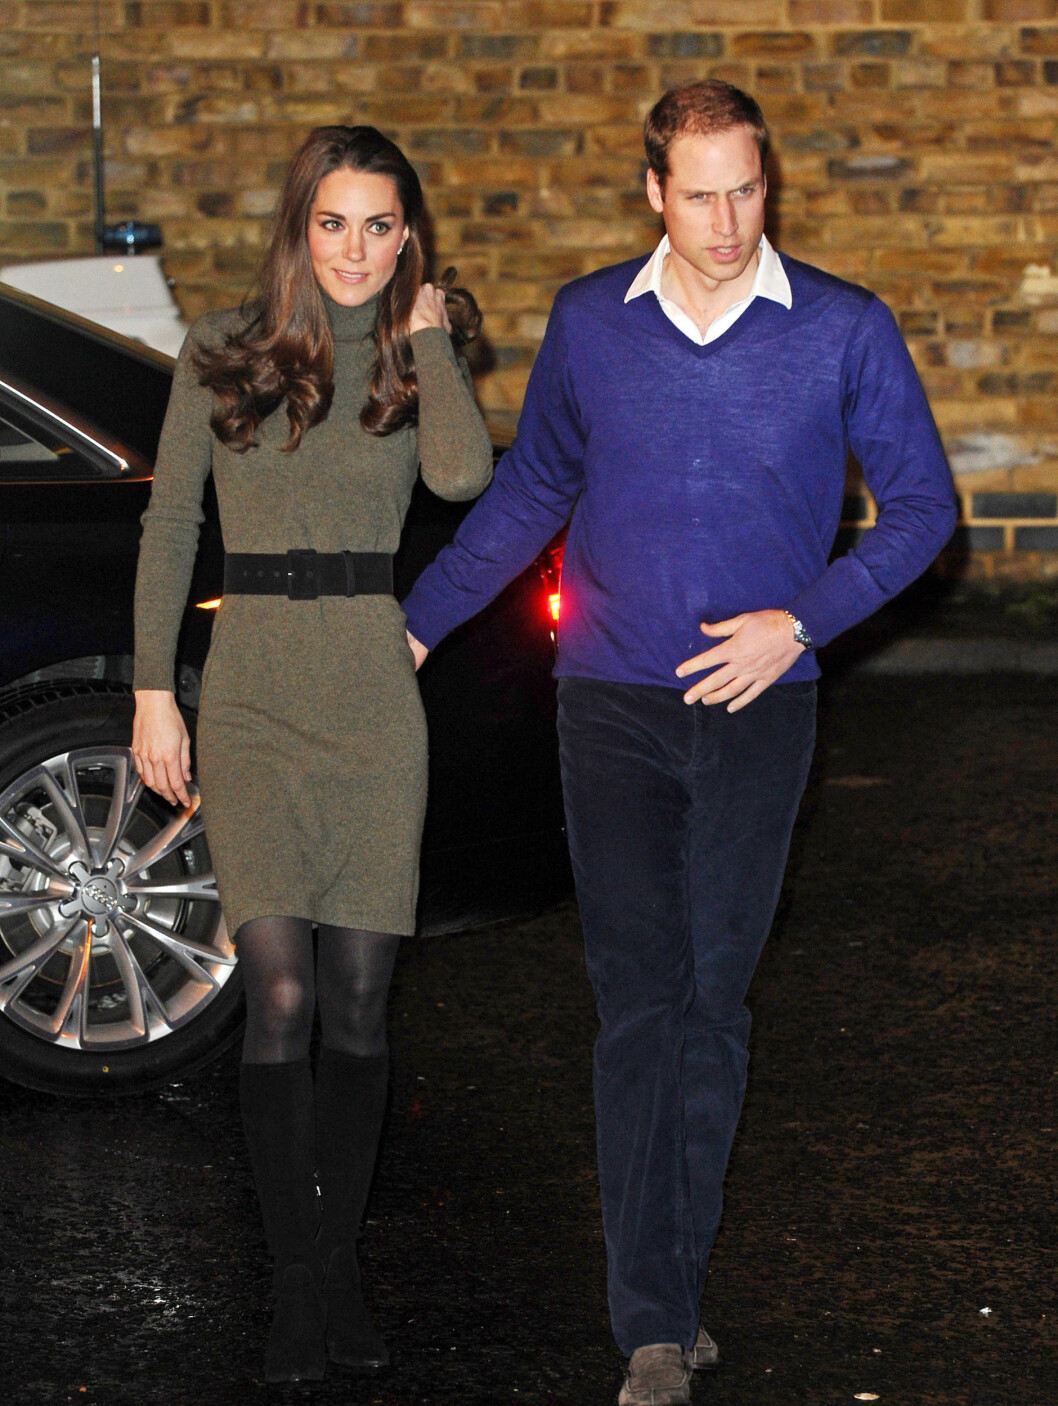 FORELSKA: Prins William la en kjærlig hånd på sin kones bakdel, da de var på vei inn til senteret for hjemløse tidligere denne uken. Foto: Stella Pictures